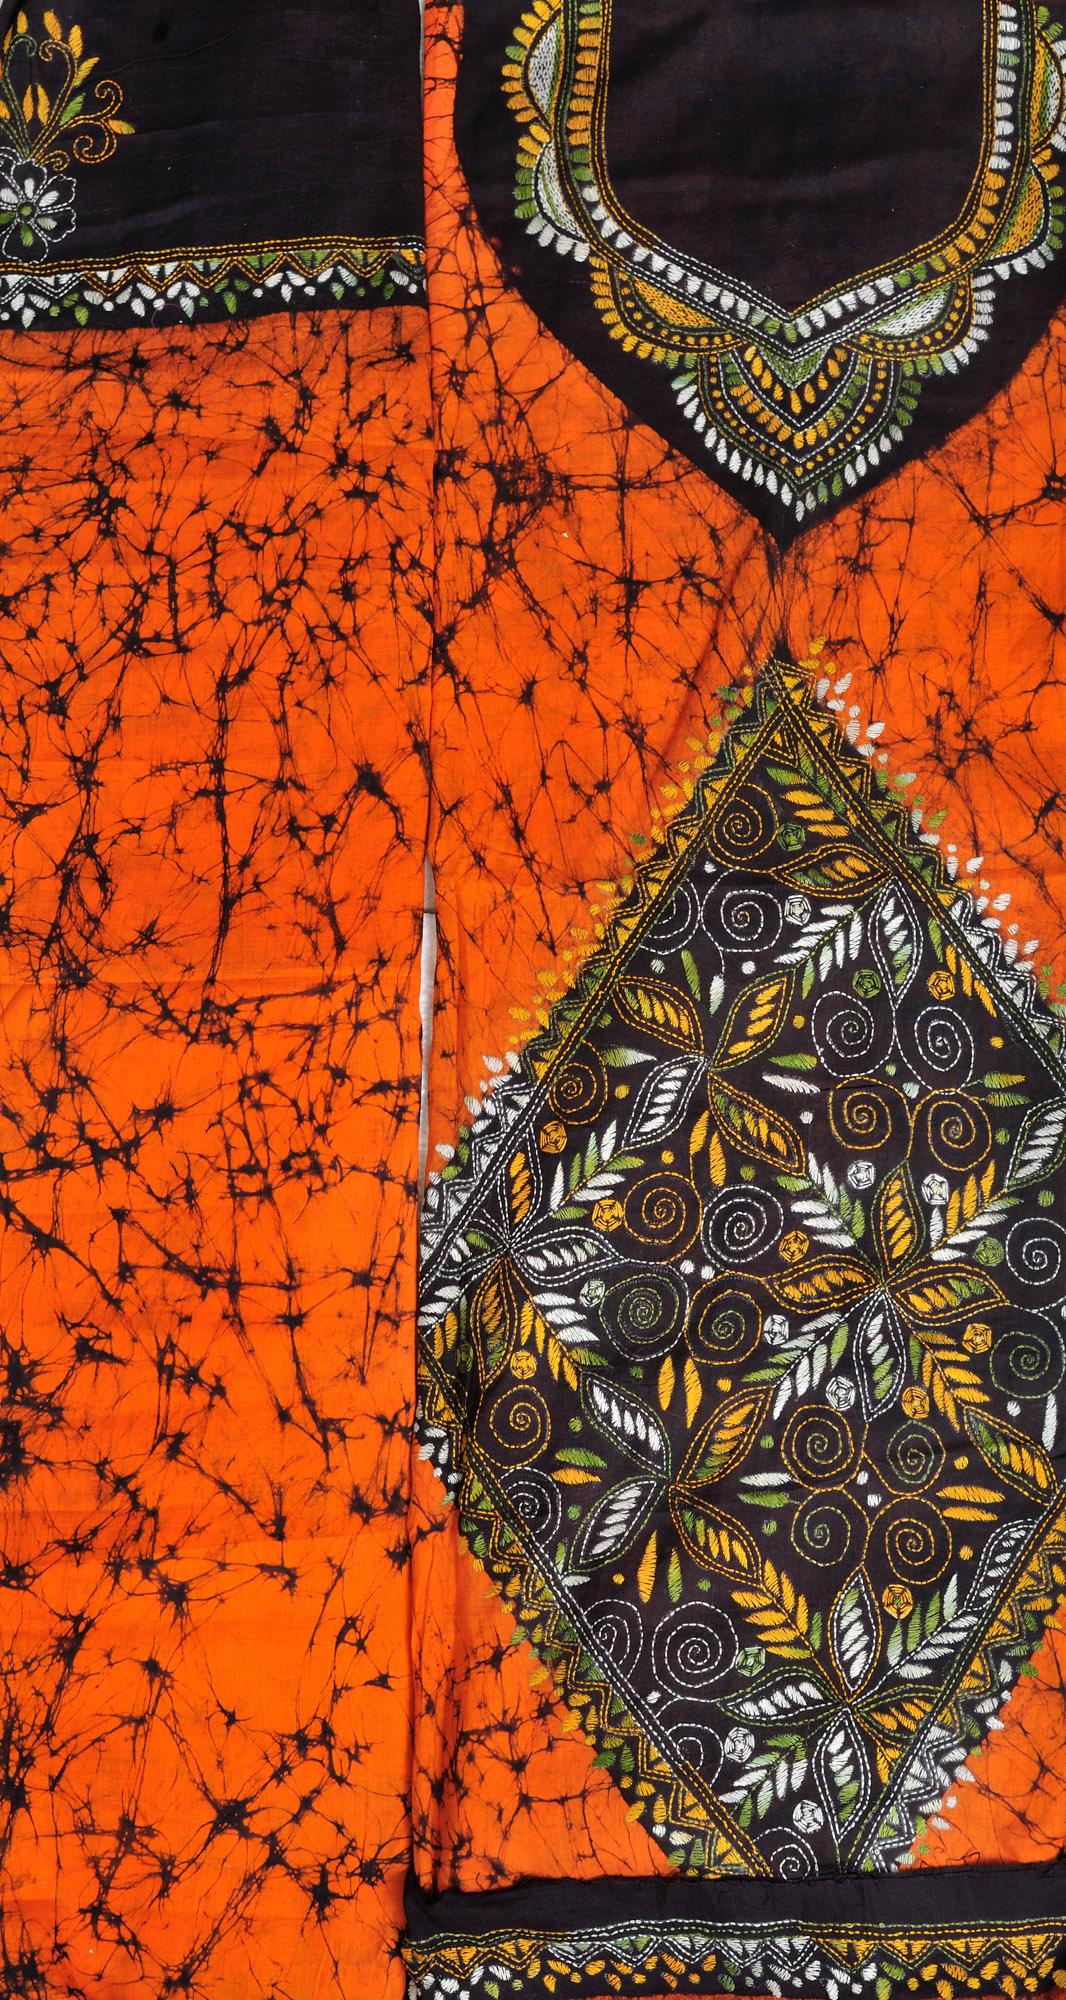 Orange and black batik salwar kameez fabric from kolkata